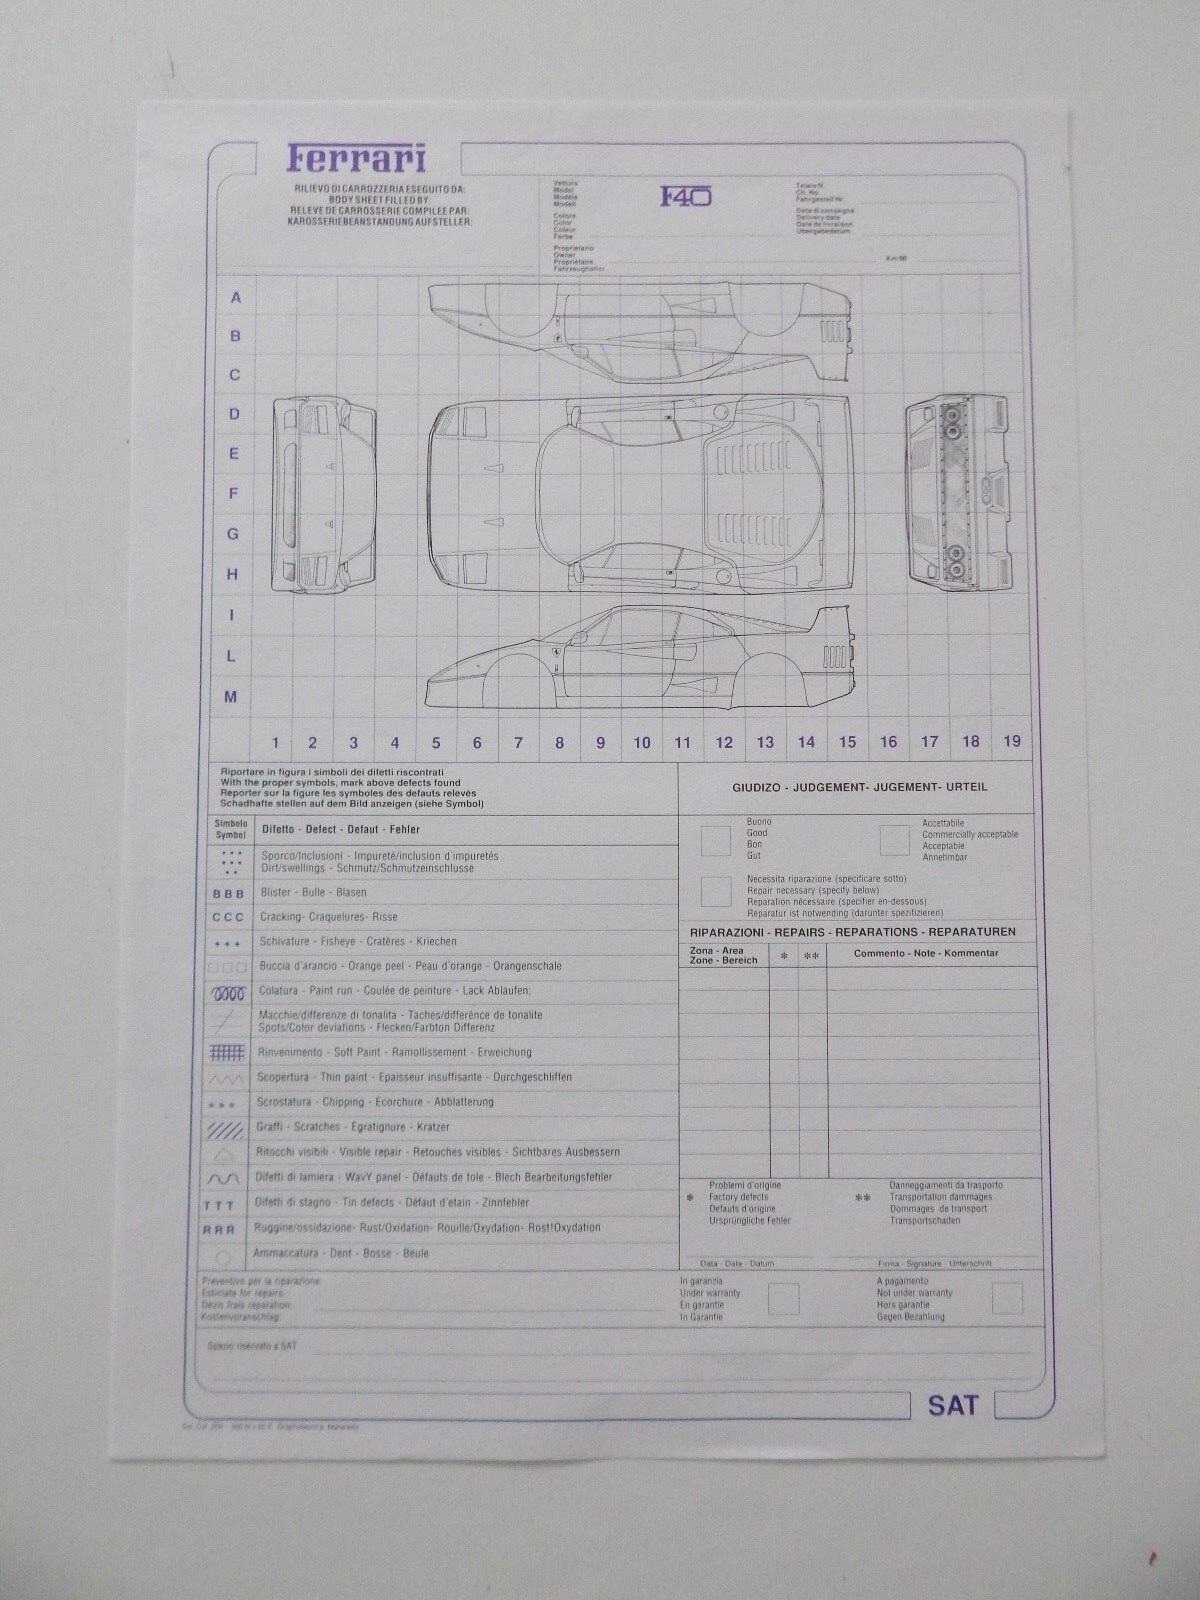 Cool F40 Repair Sheet Manual Handbook Ferrari Njrhkn711 Other Car Manuals Wiring Digital Resources Ntnesshebarightsorg